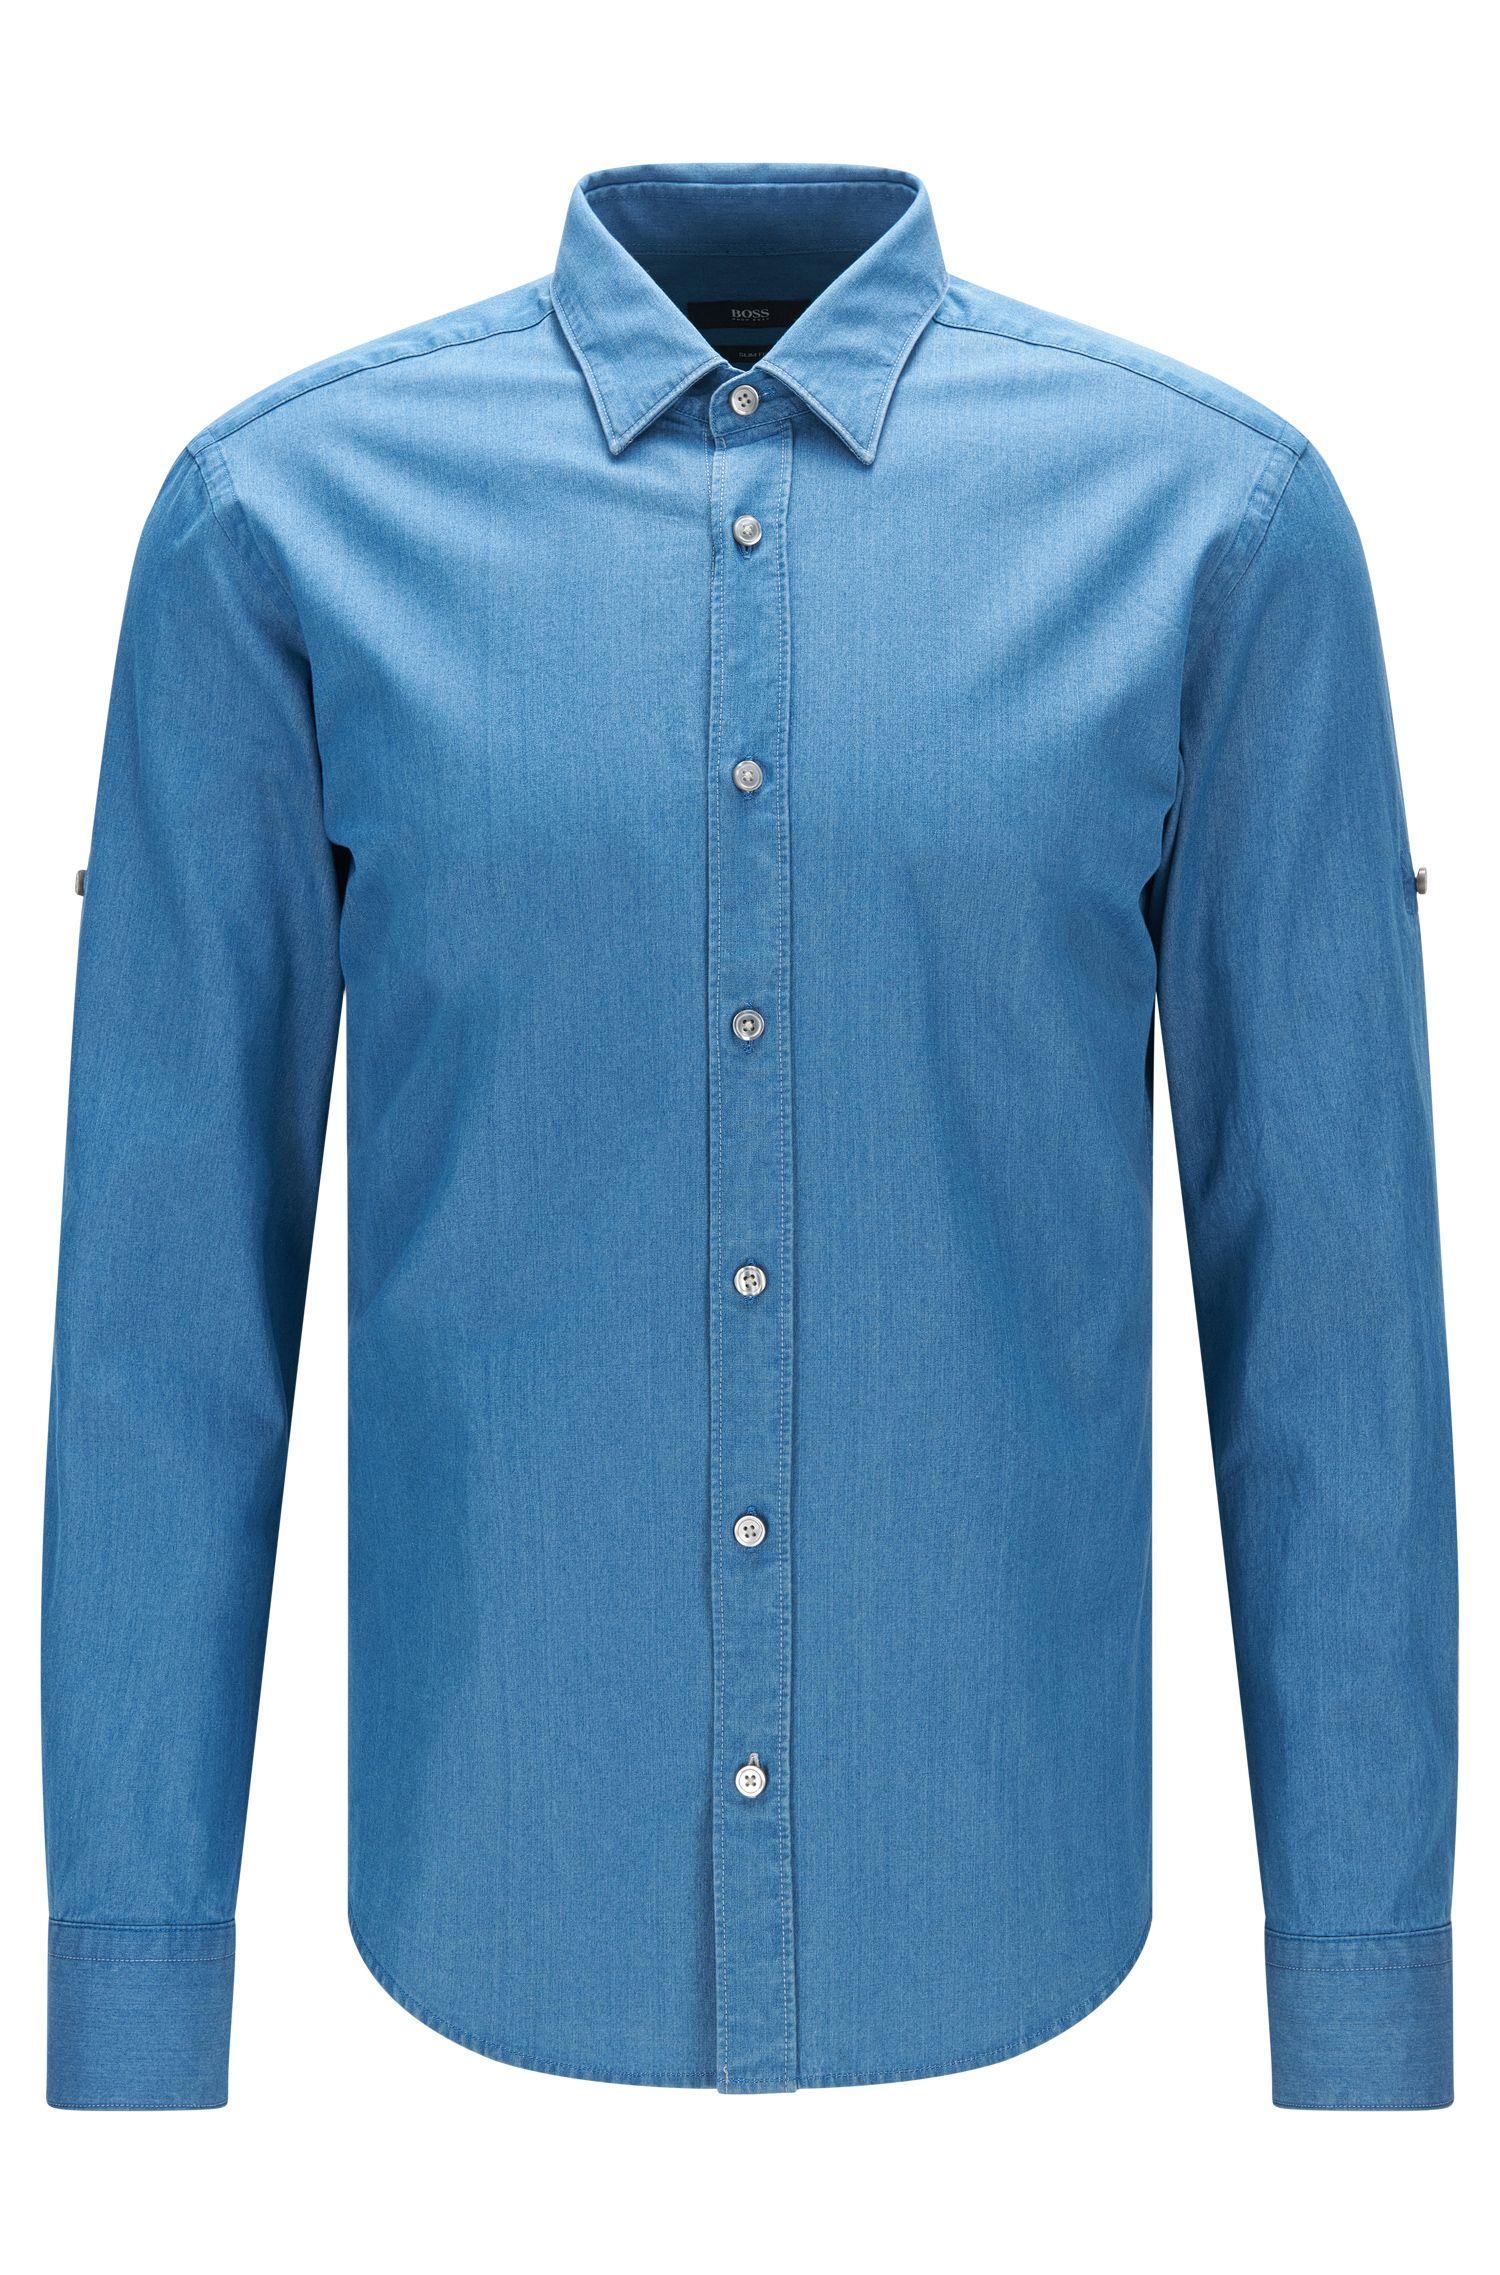 'Reid' | Slim Fit, Chambray Cotton Button Down Shirt